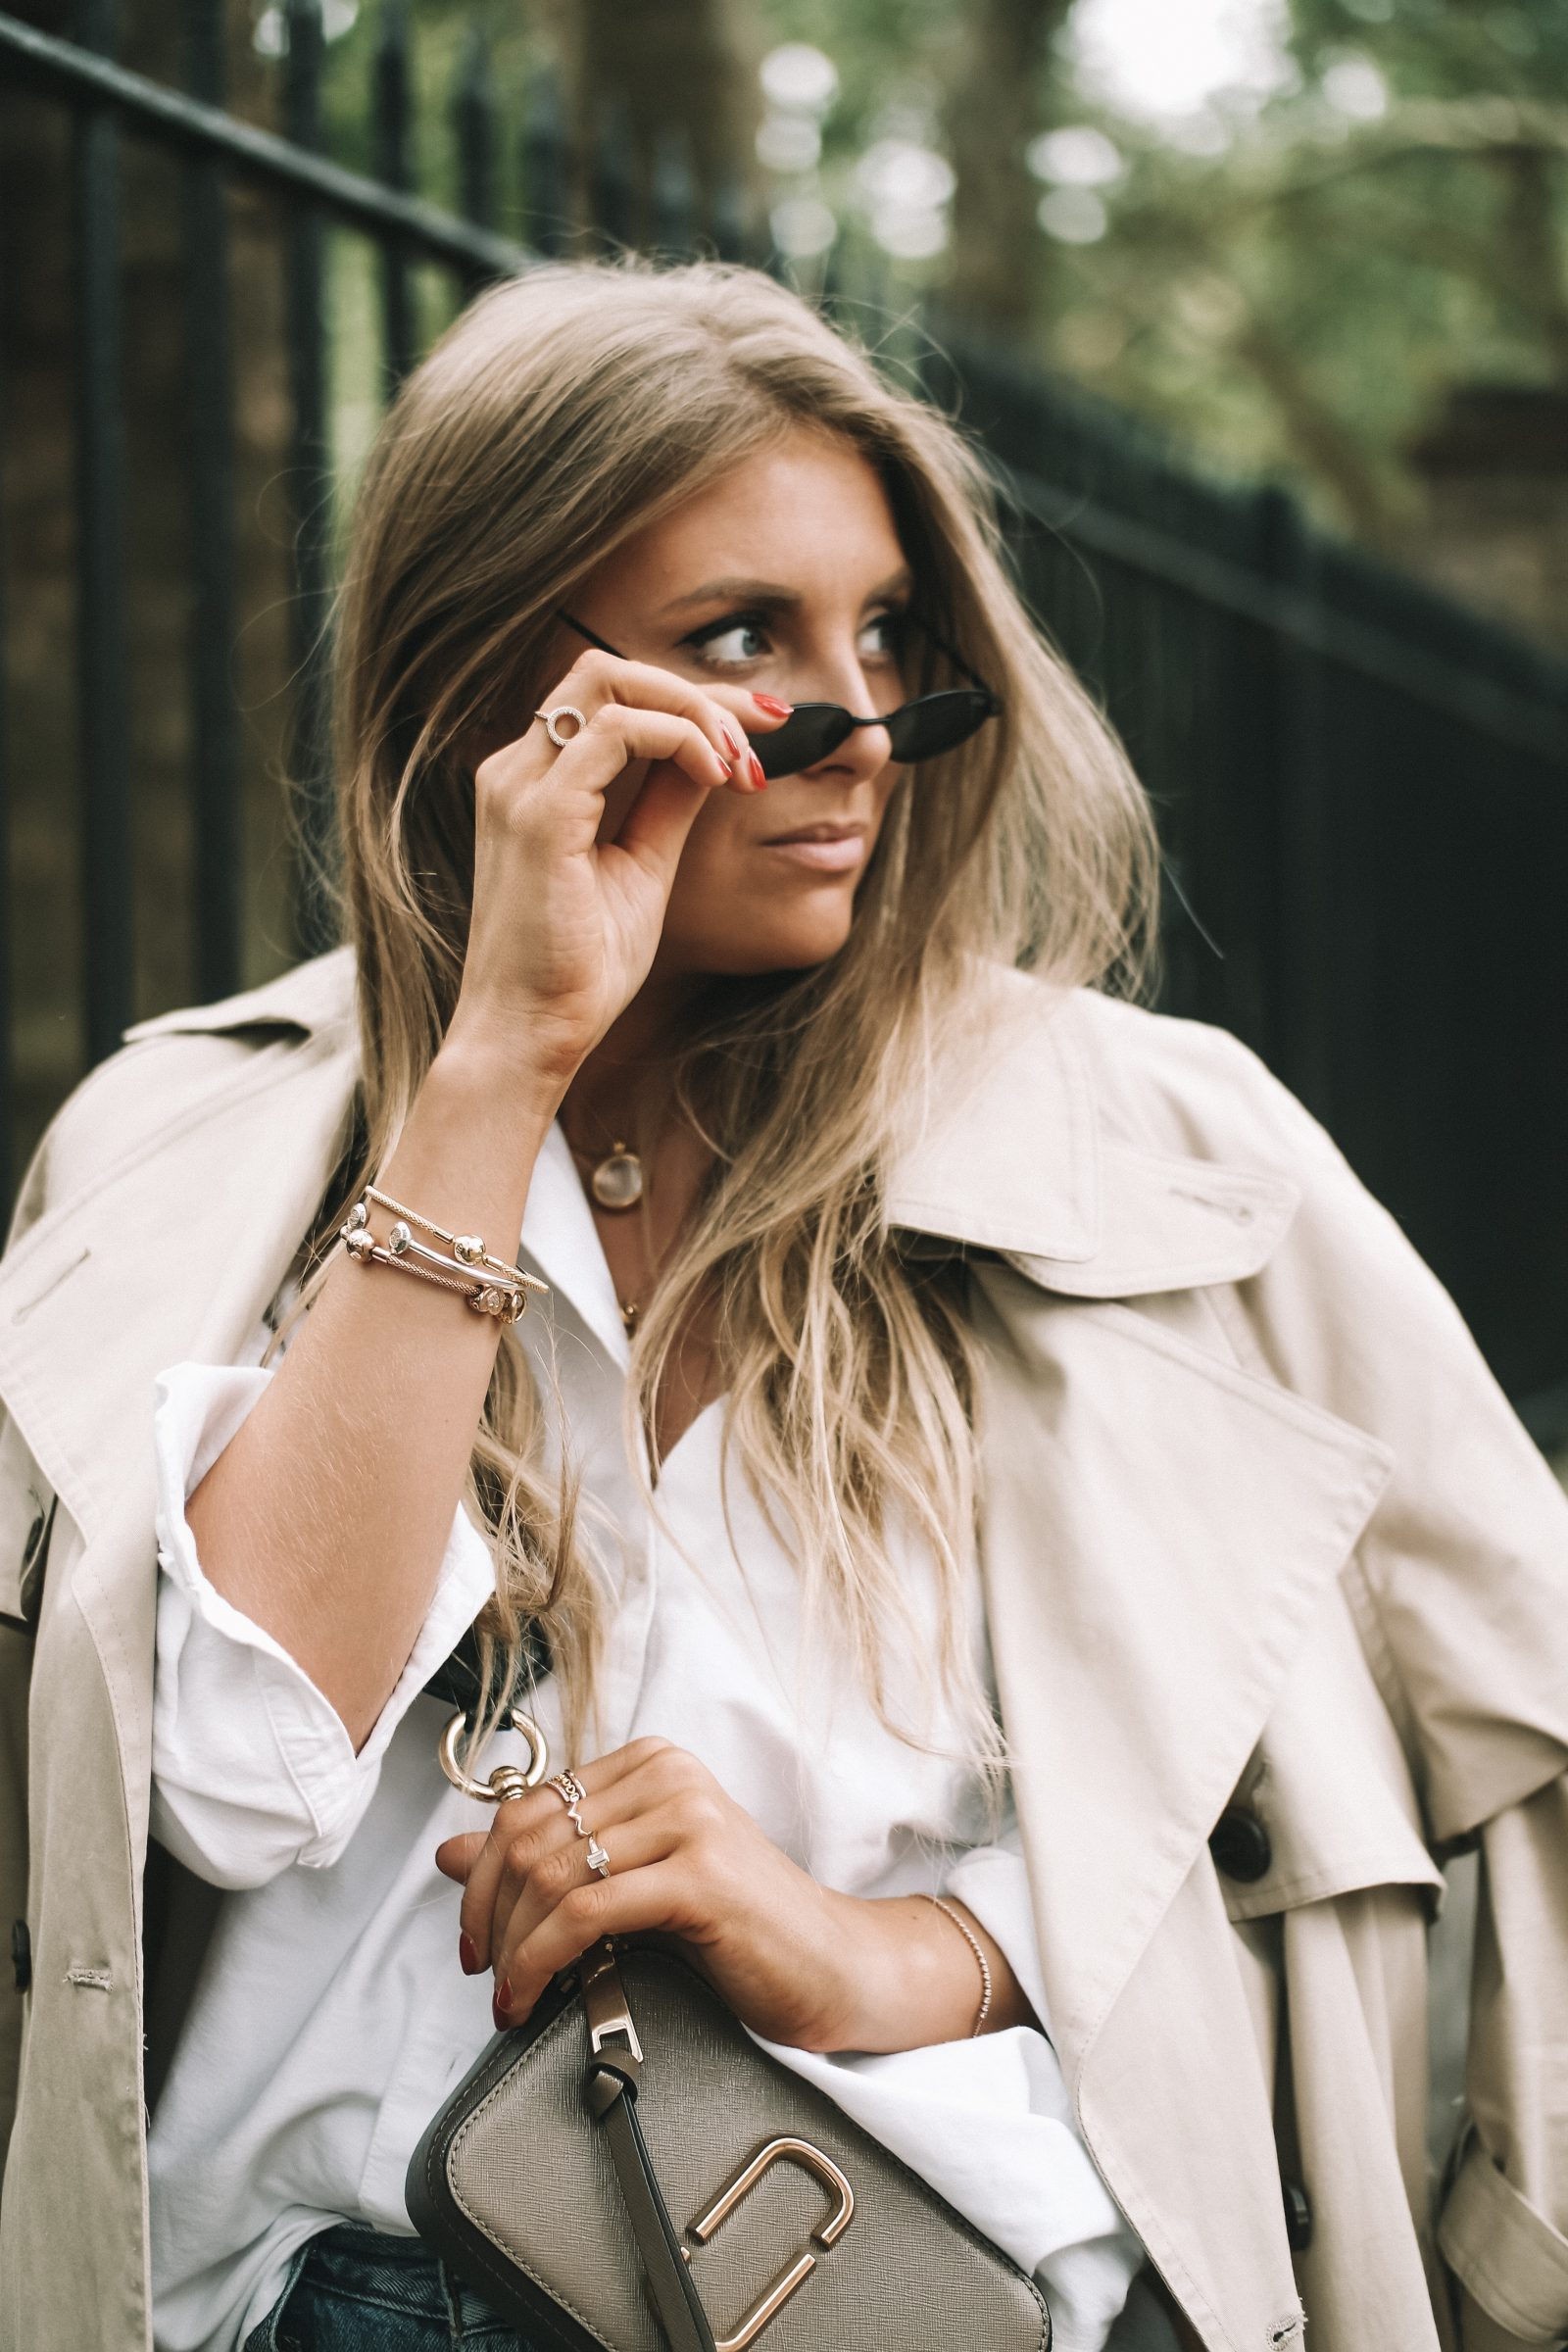 LFW Street Style - Quay Micro Sunglasses